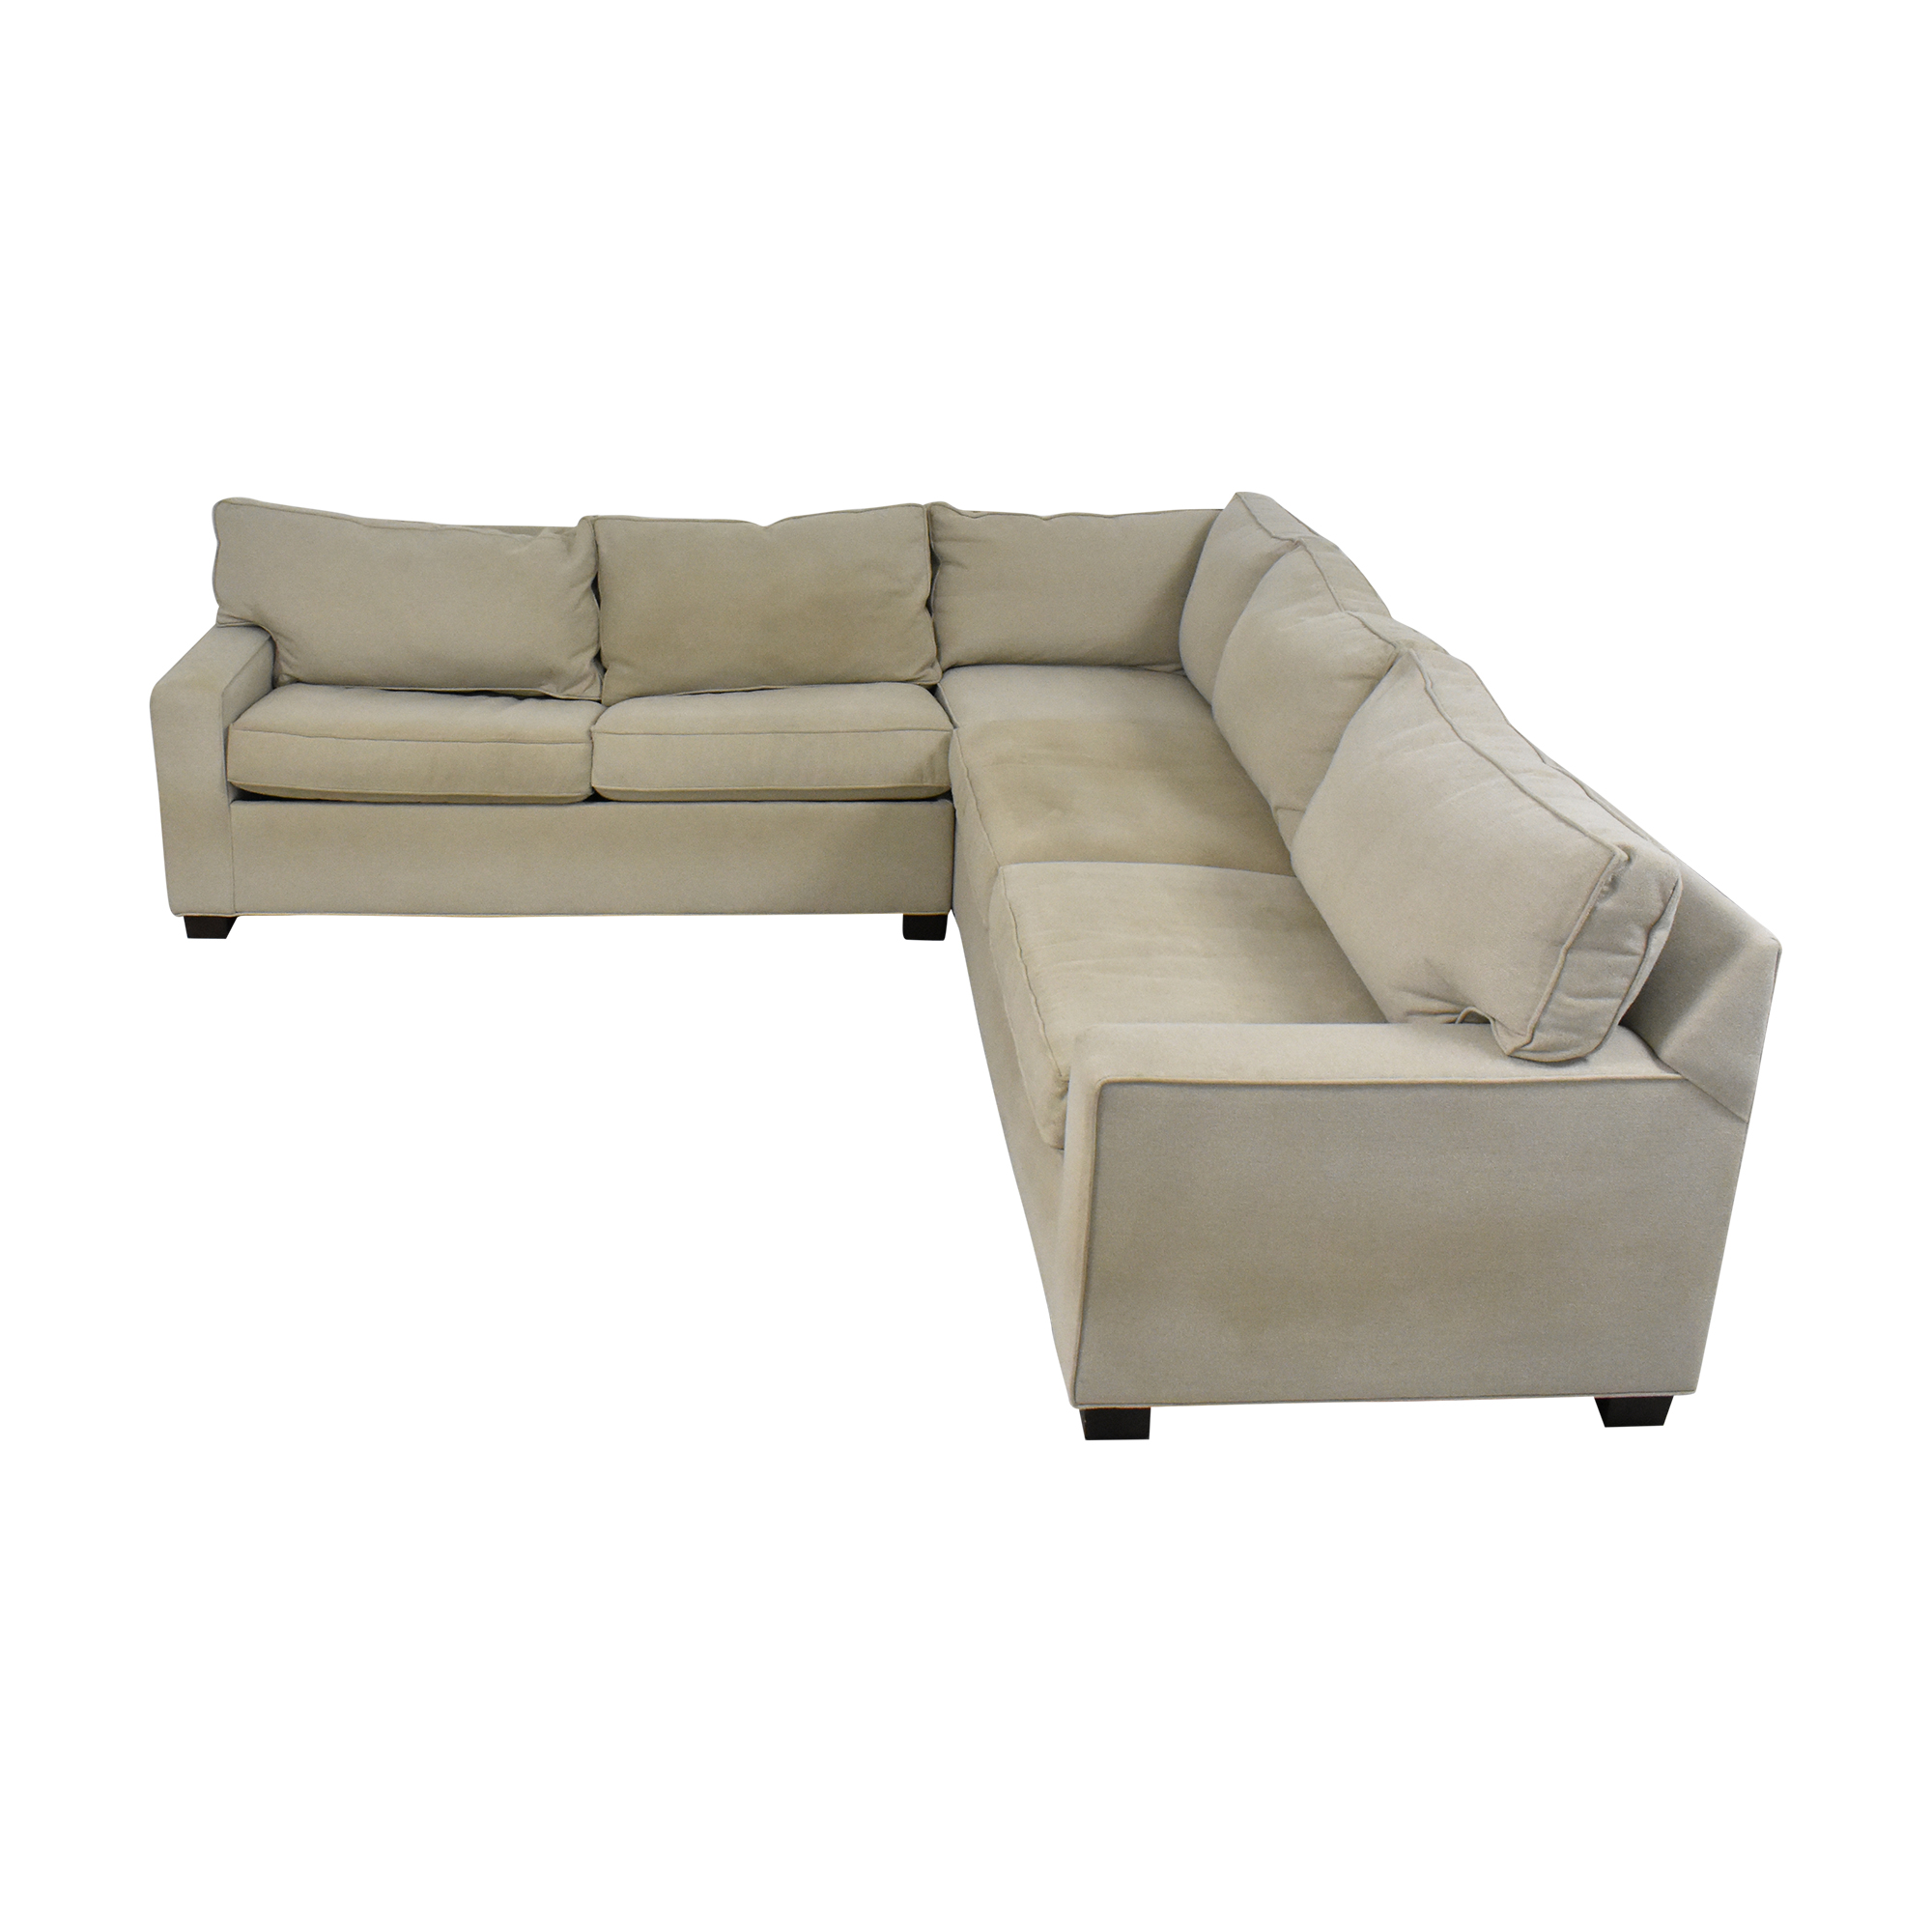 Mitchell Gold + Bob Williams Mitchell Gold + Bob Williams Sectional Sleeper Sofa coupon